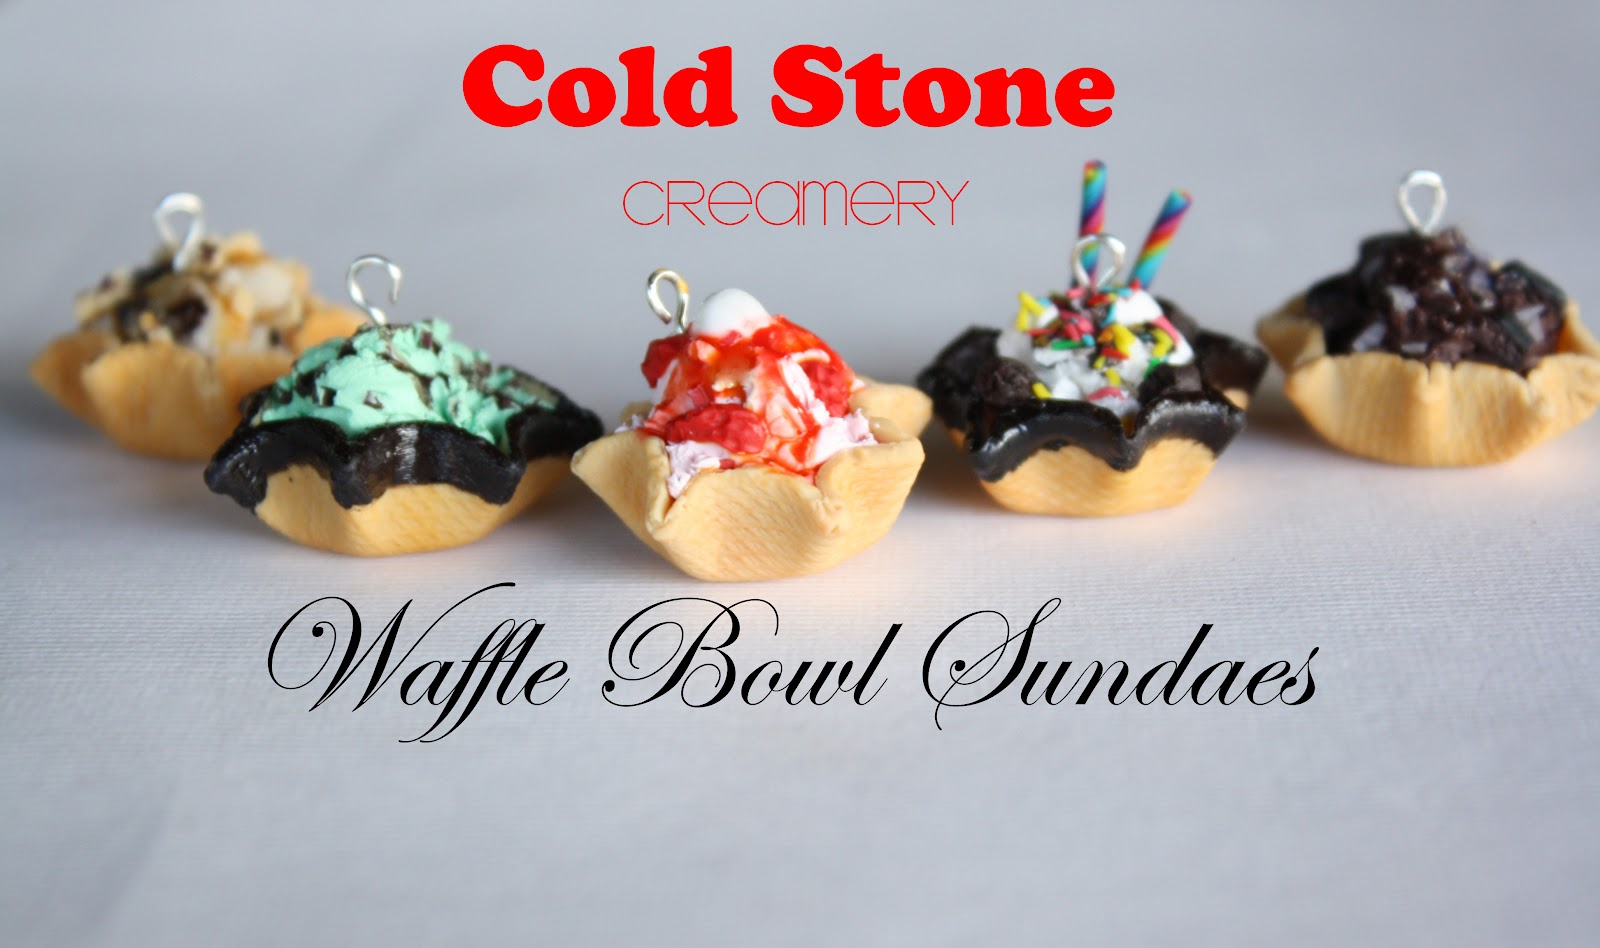 Cold Stone Creamery Forsyth, GA